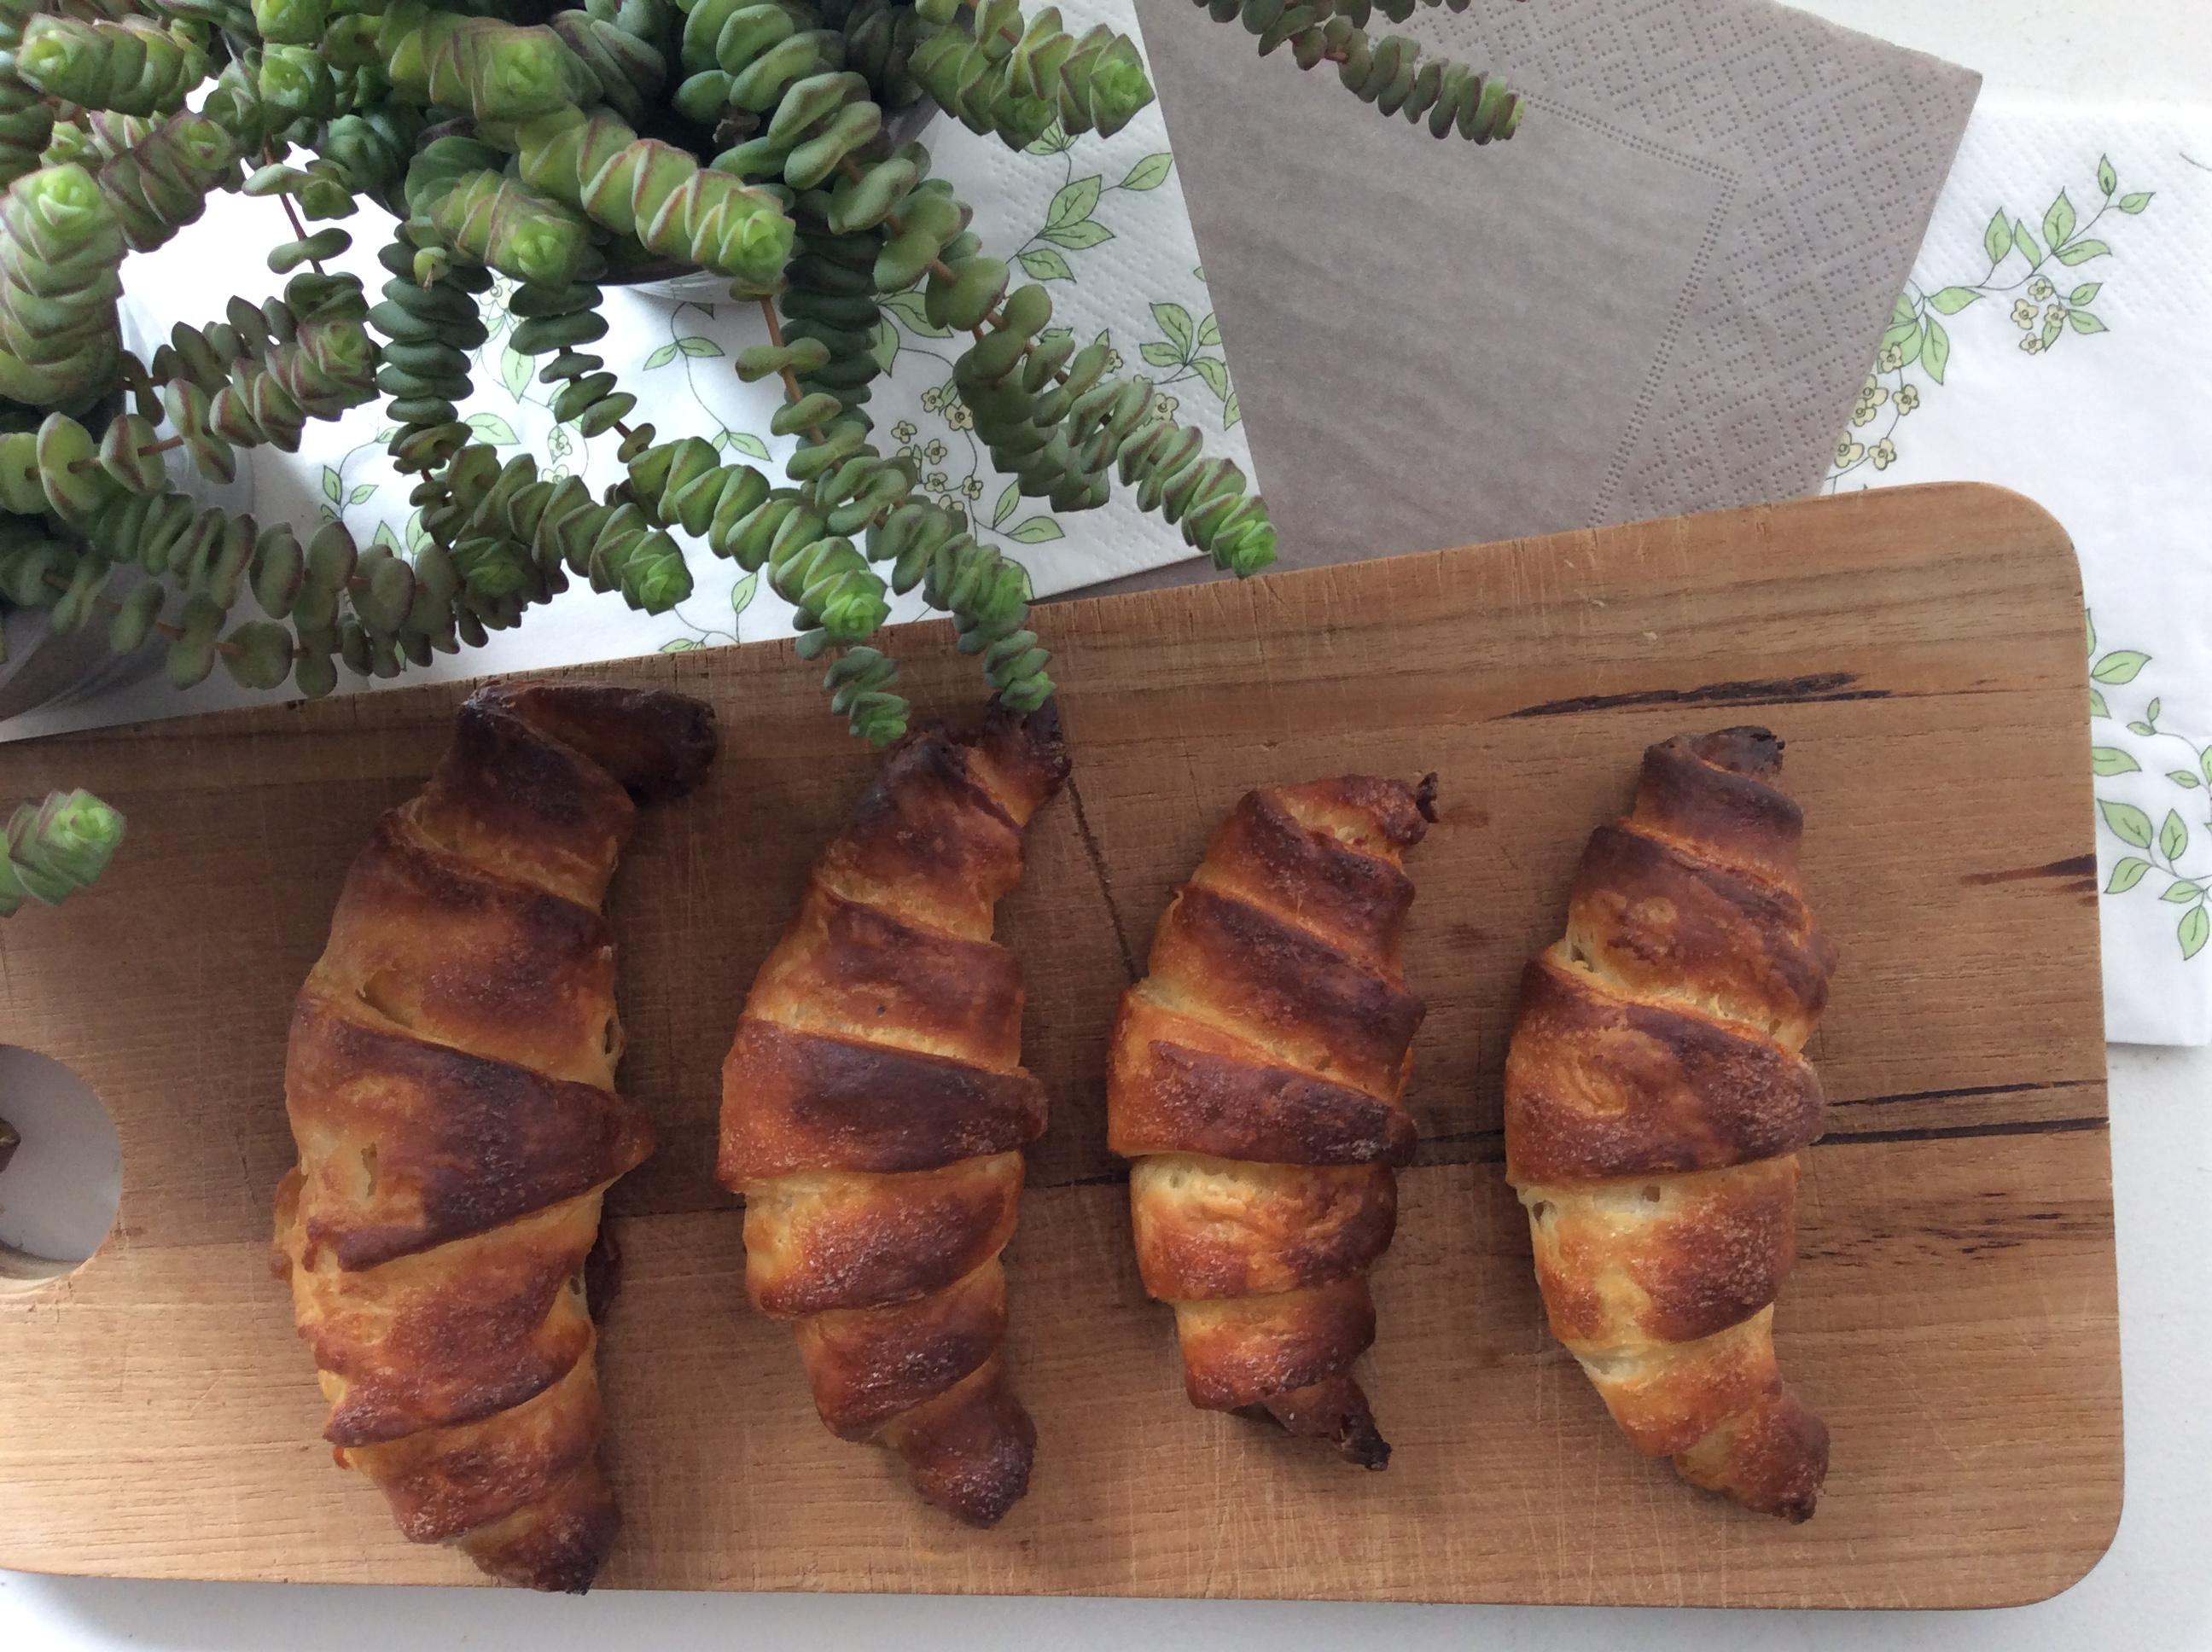 Luftige og lækre glutenfri croissanter